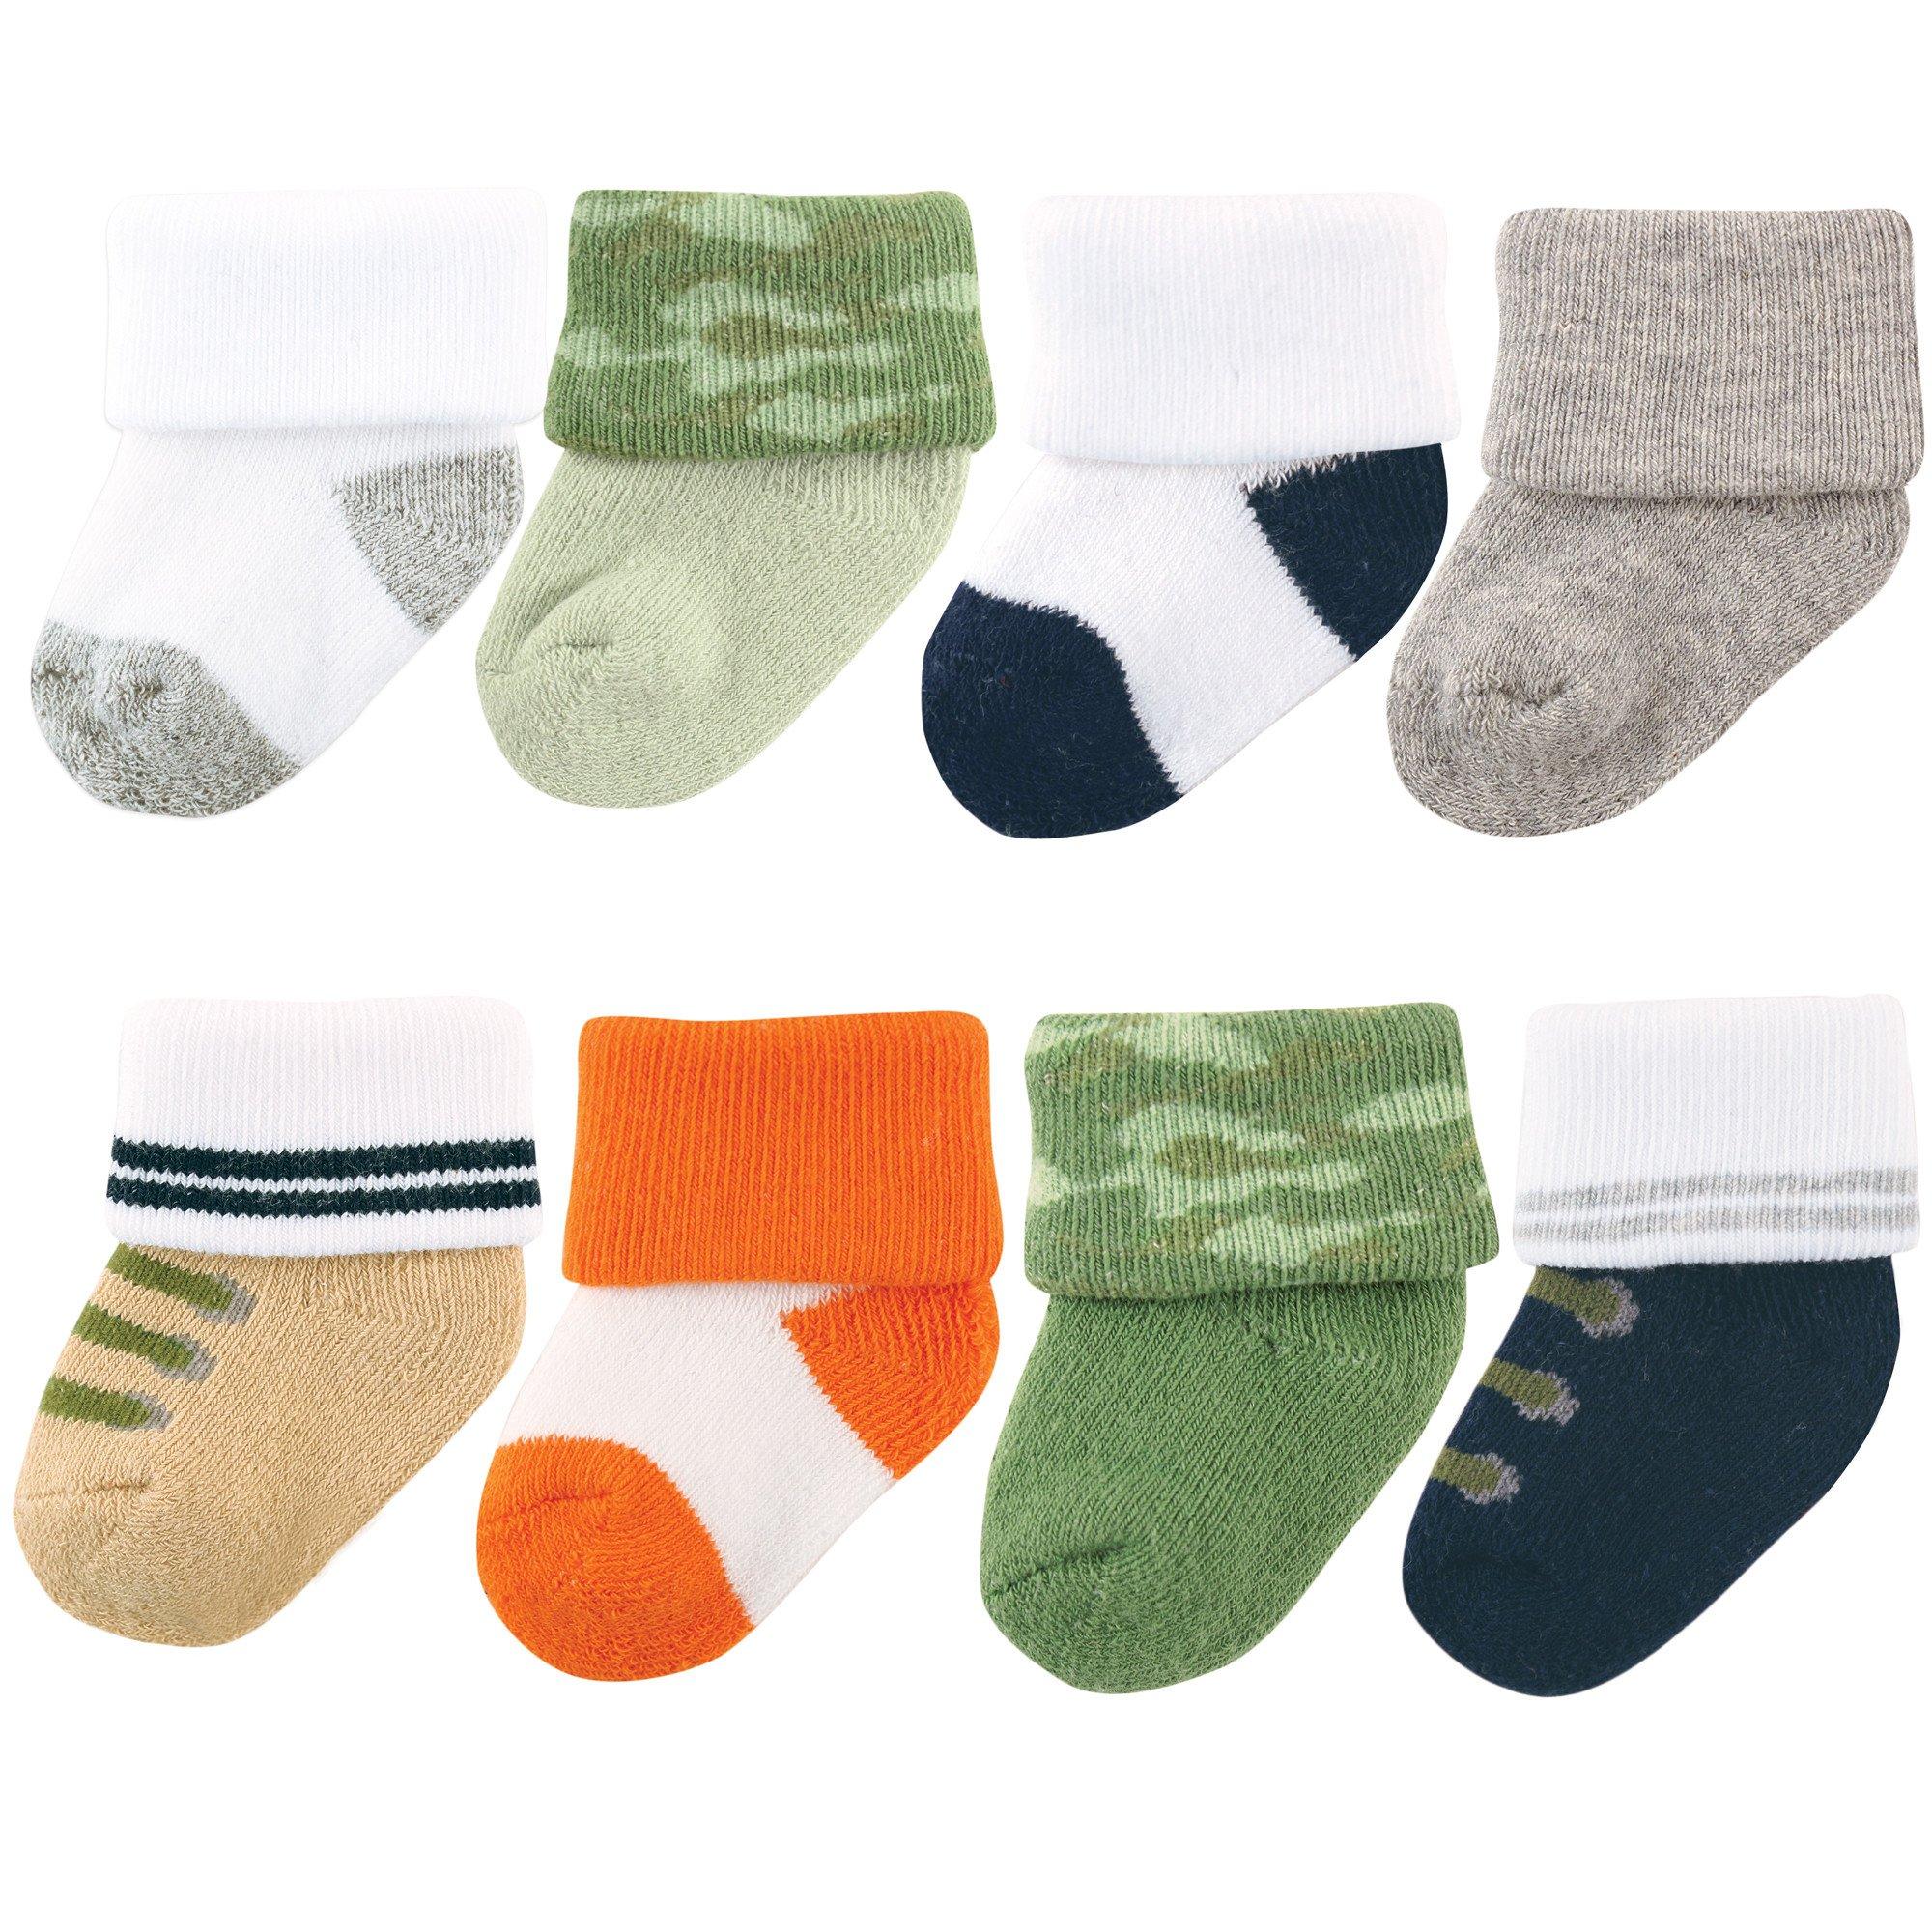 Luvable Friends Unisex Baby Socks, Camo